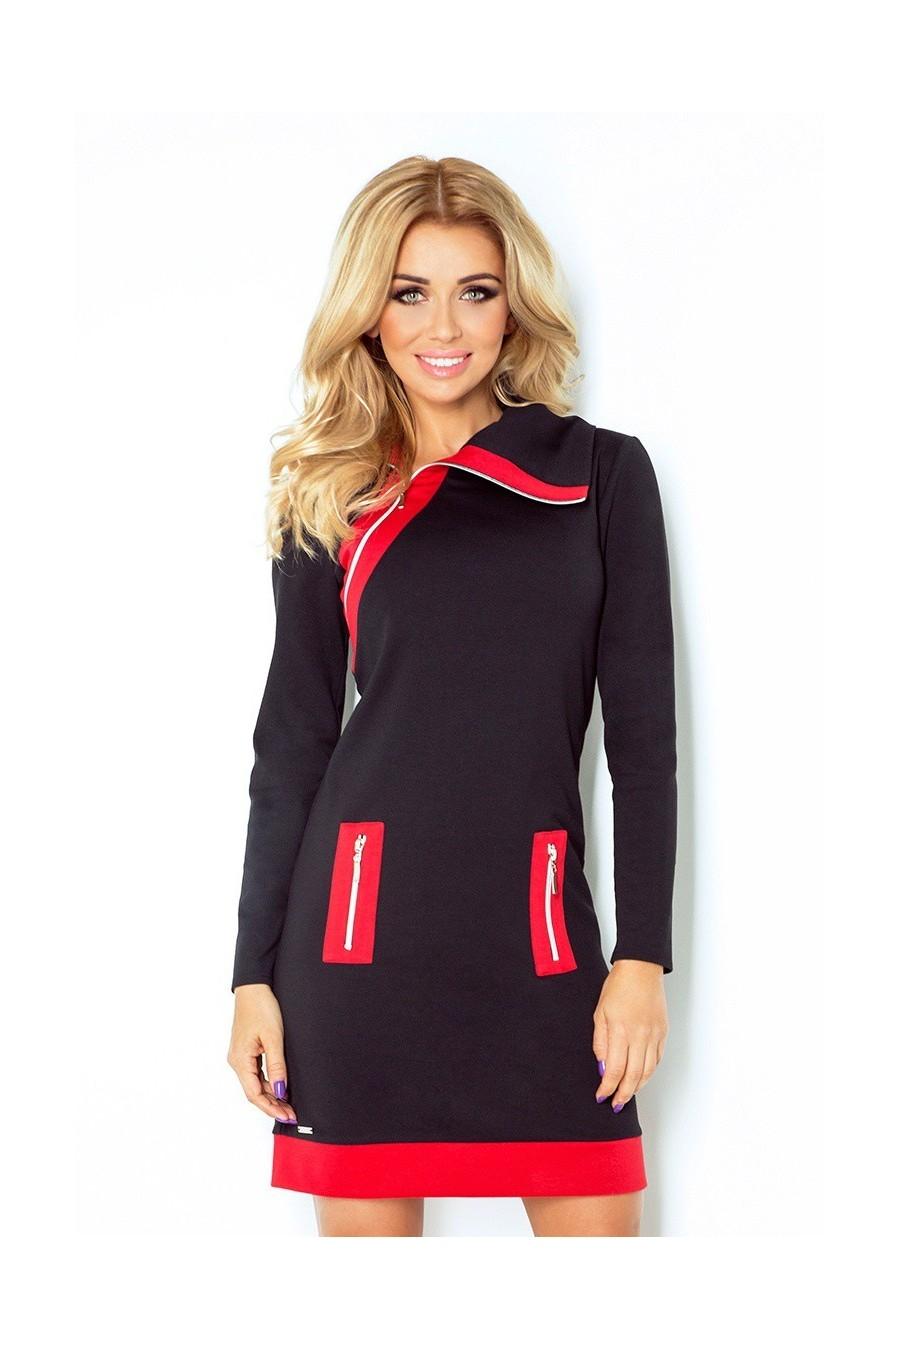 385ac1addb6a Dámske šaty na zips s rukávom 2670 - Spoločenské šaty Online